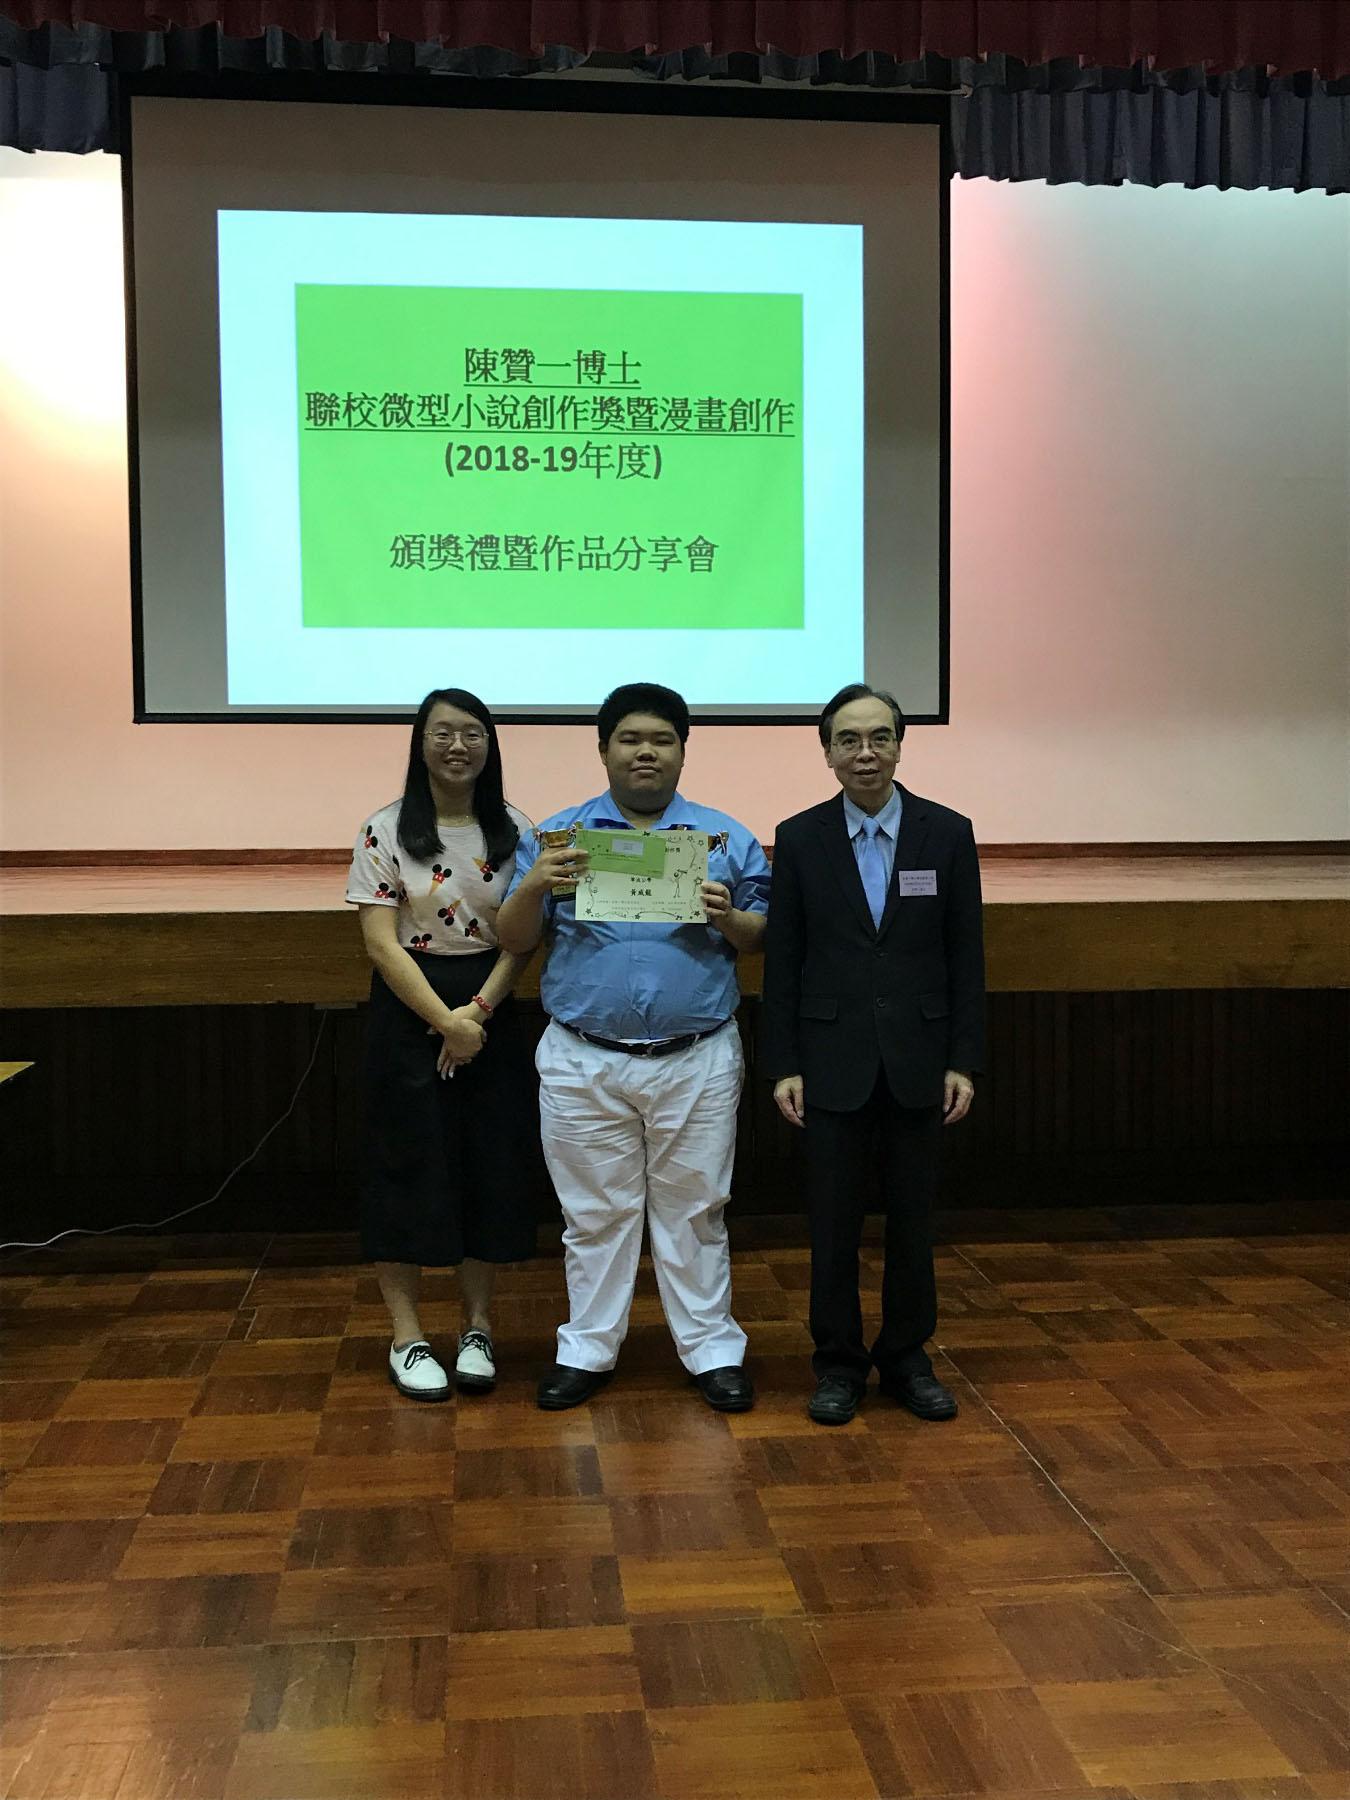 http://npc.edu.hk/sites/default/files/img_3894_1.jpg